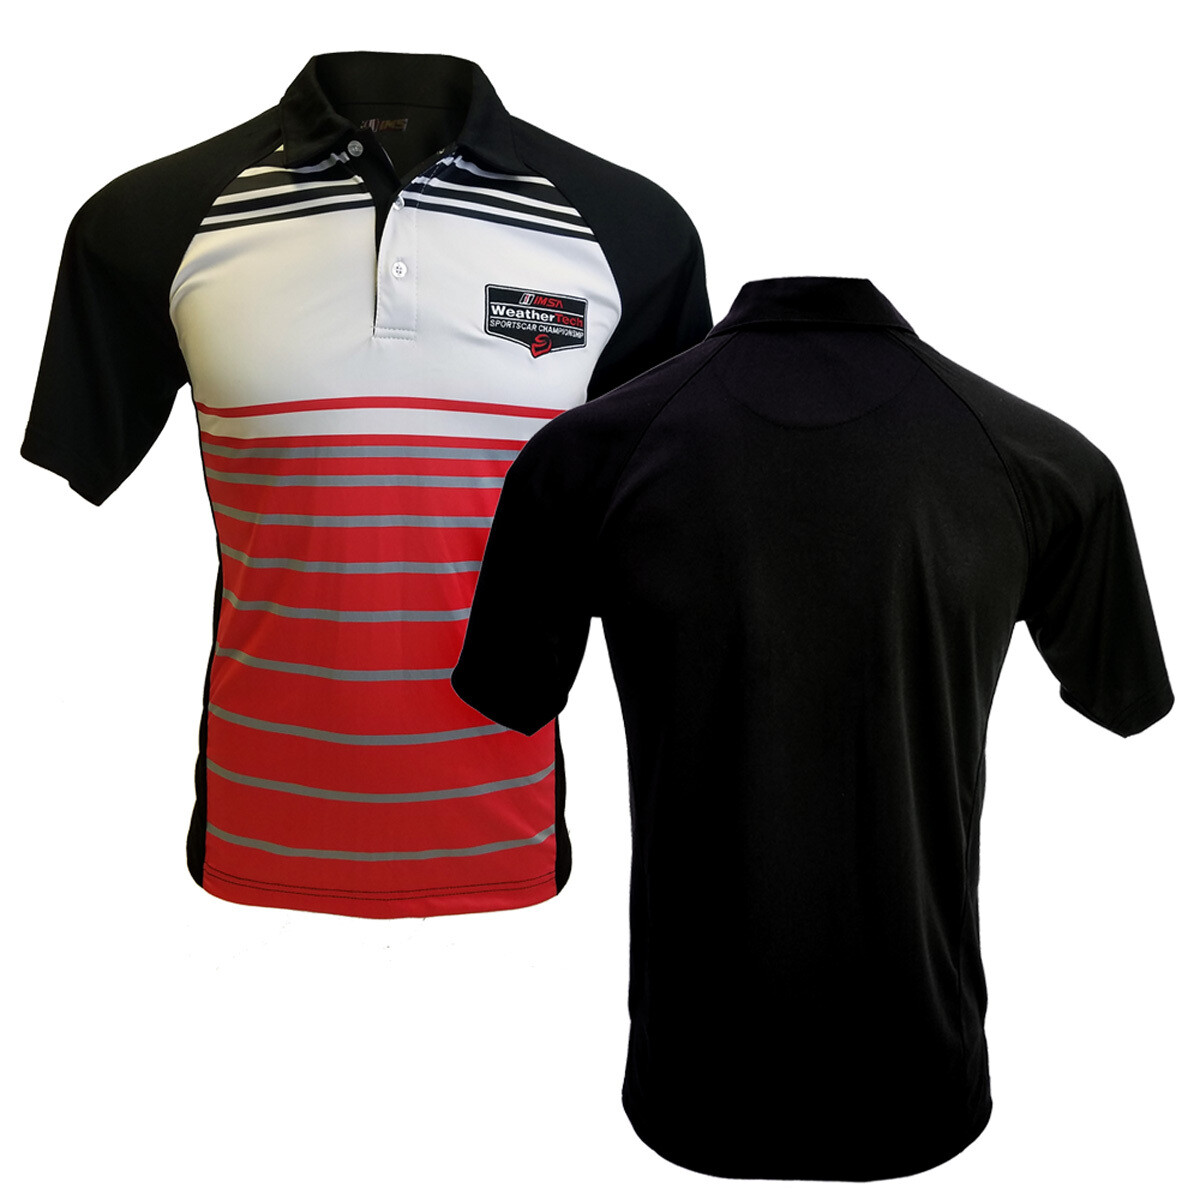 WeatherTech Polo - Red/Black/White